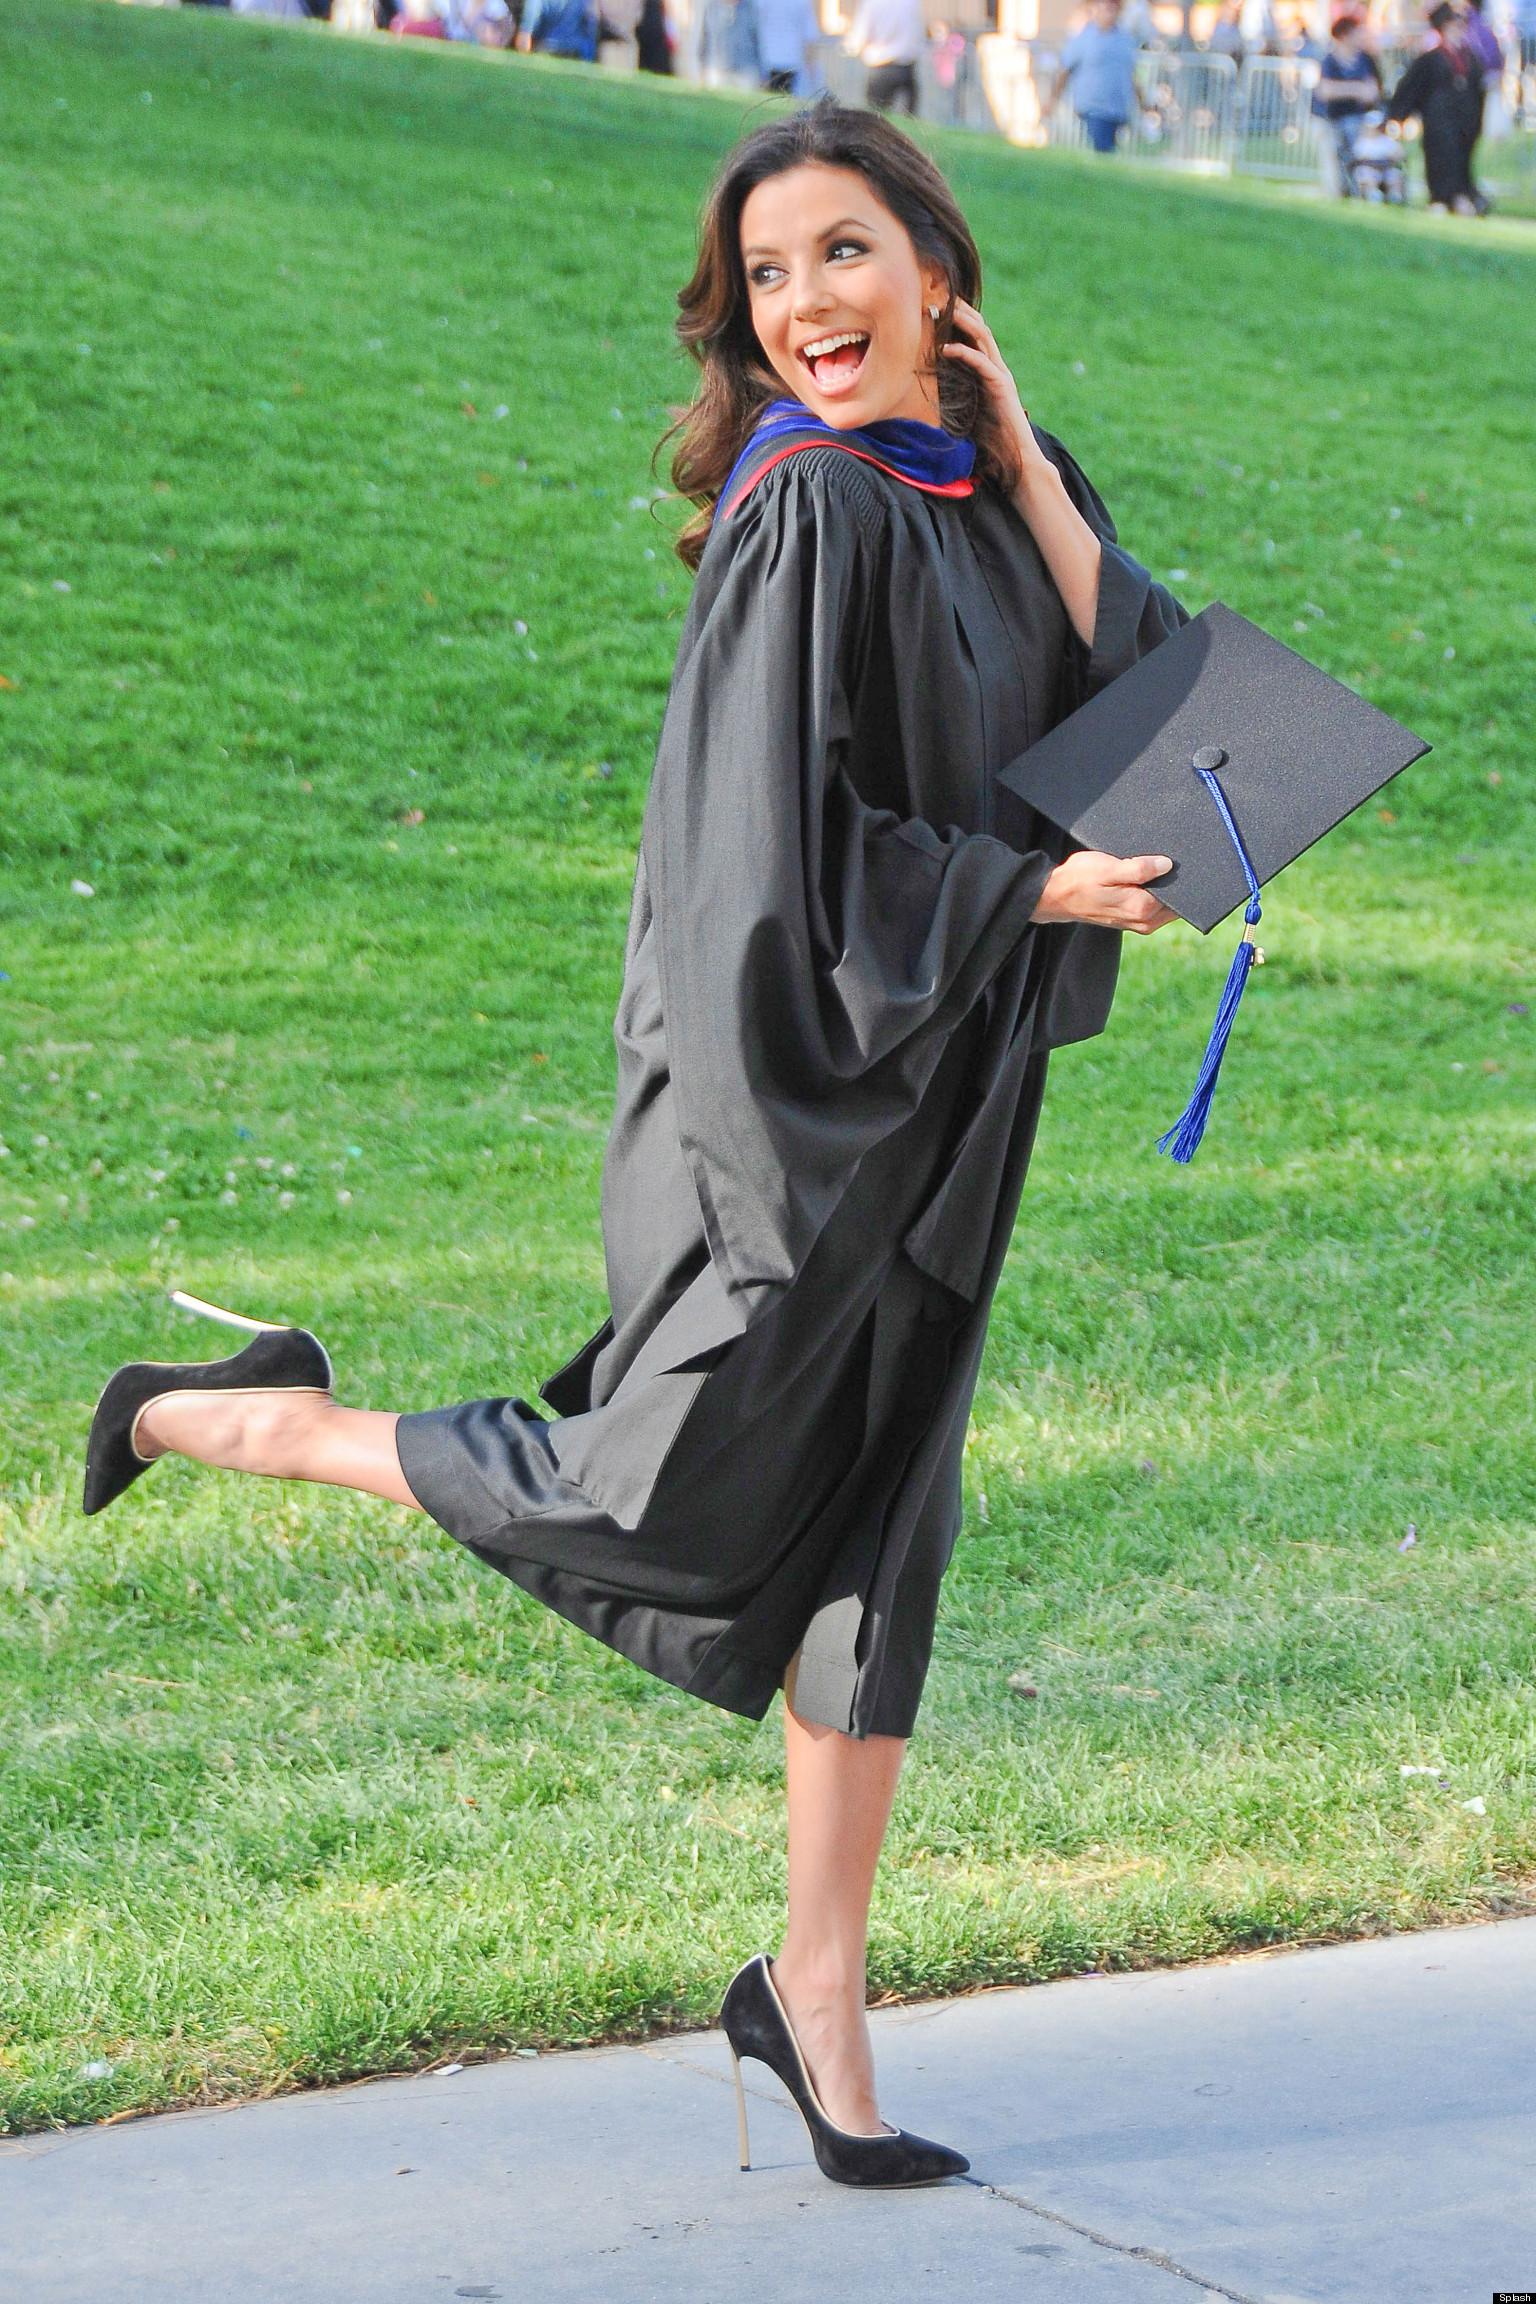 La Tech University >> Eva Longoria Graduates As She Picks Up Masters Degree From California State University (PICTURES ...